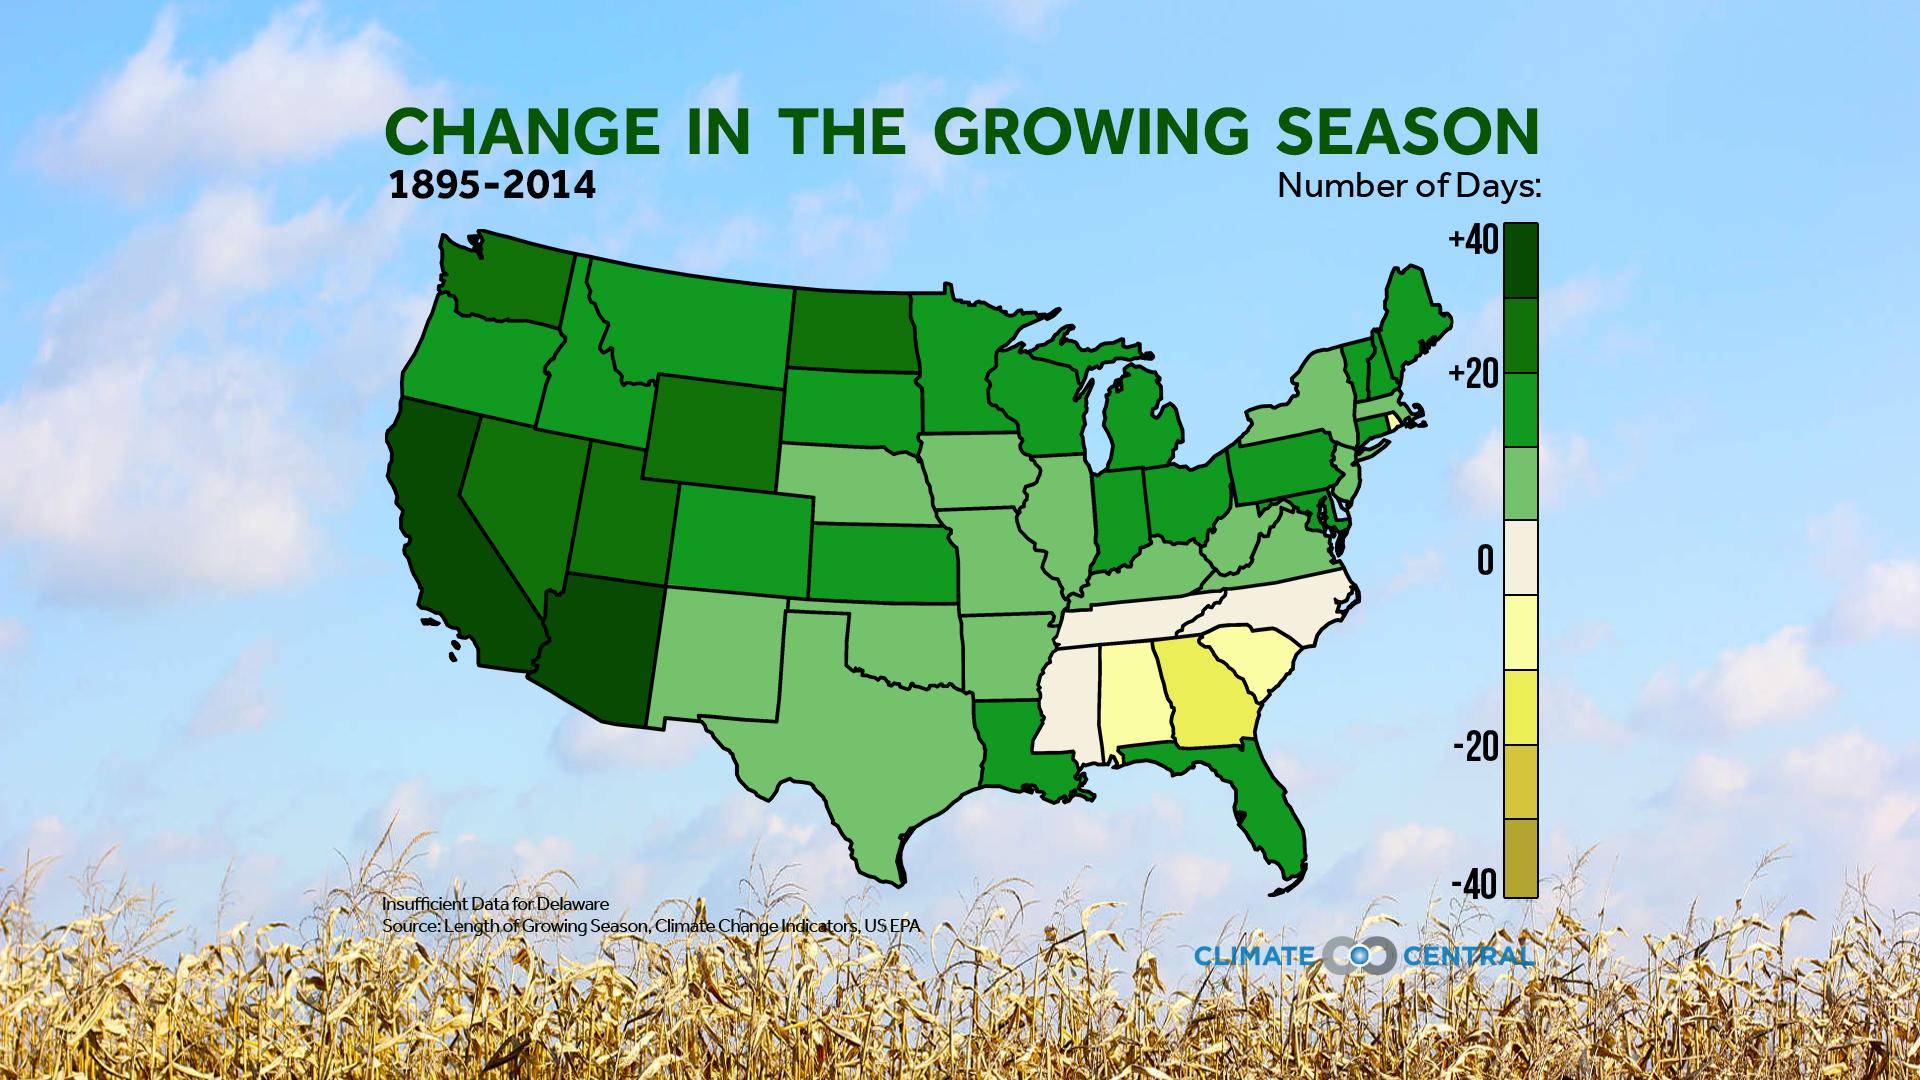 Growing Season Map Change in the Growing Season | Climate Central Growing Season Map